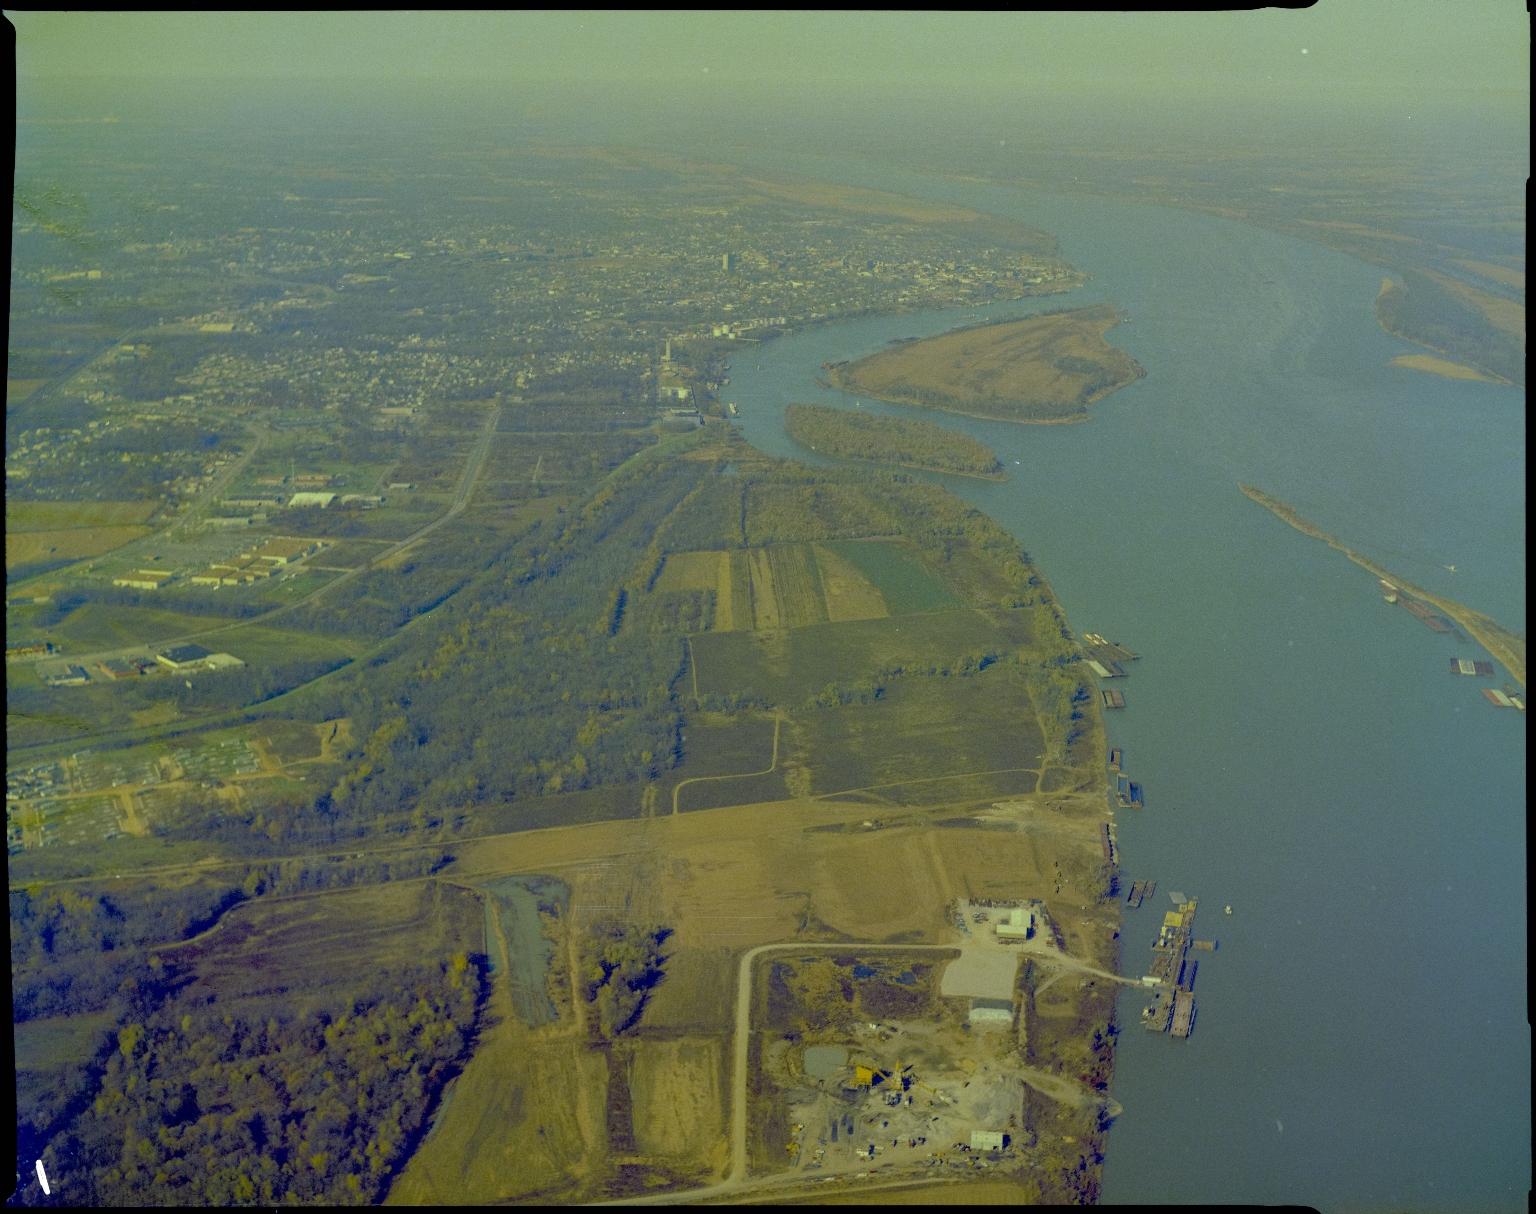 Aerialof the Ohio and Tennessee